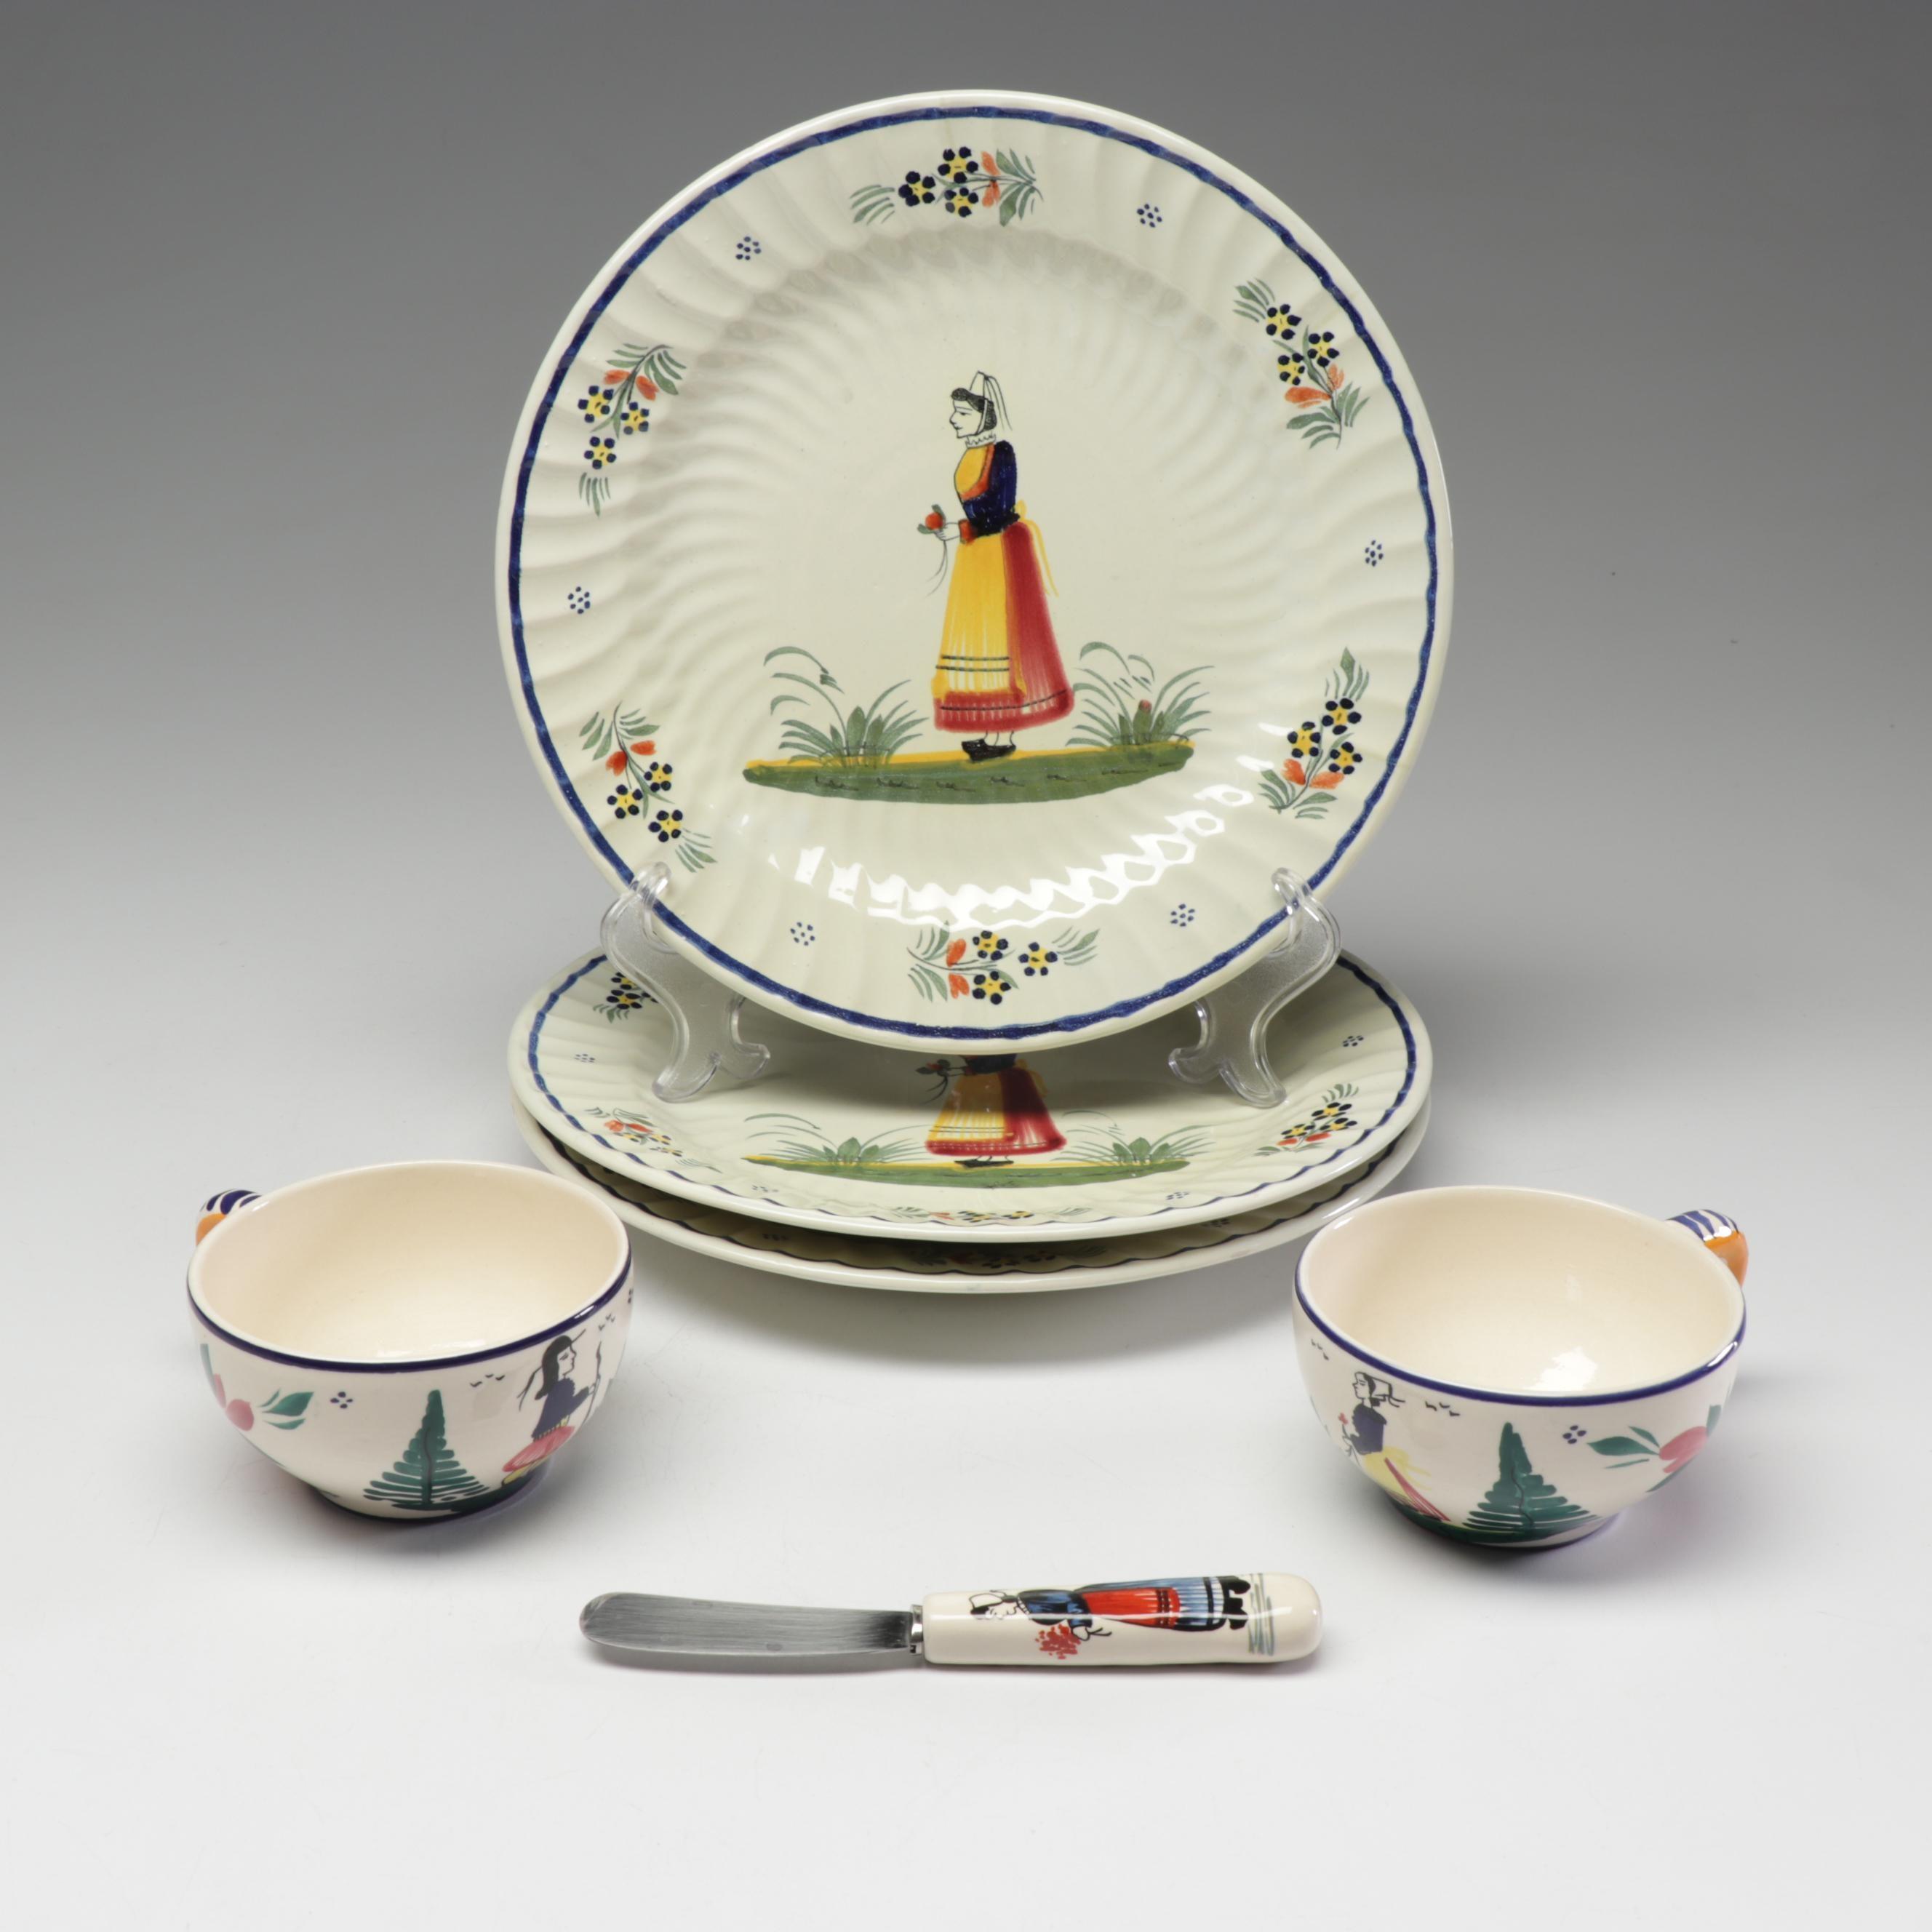 Henriot Quimper Hand-Painted Tableware